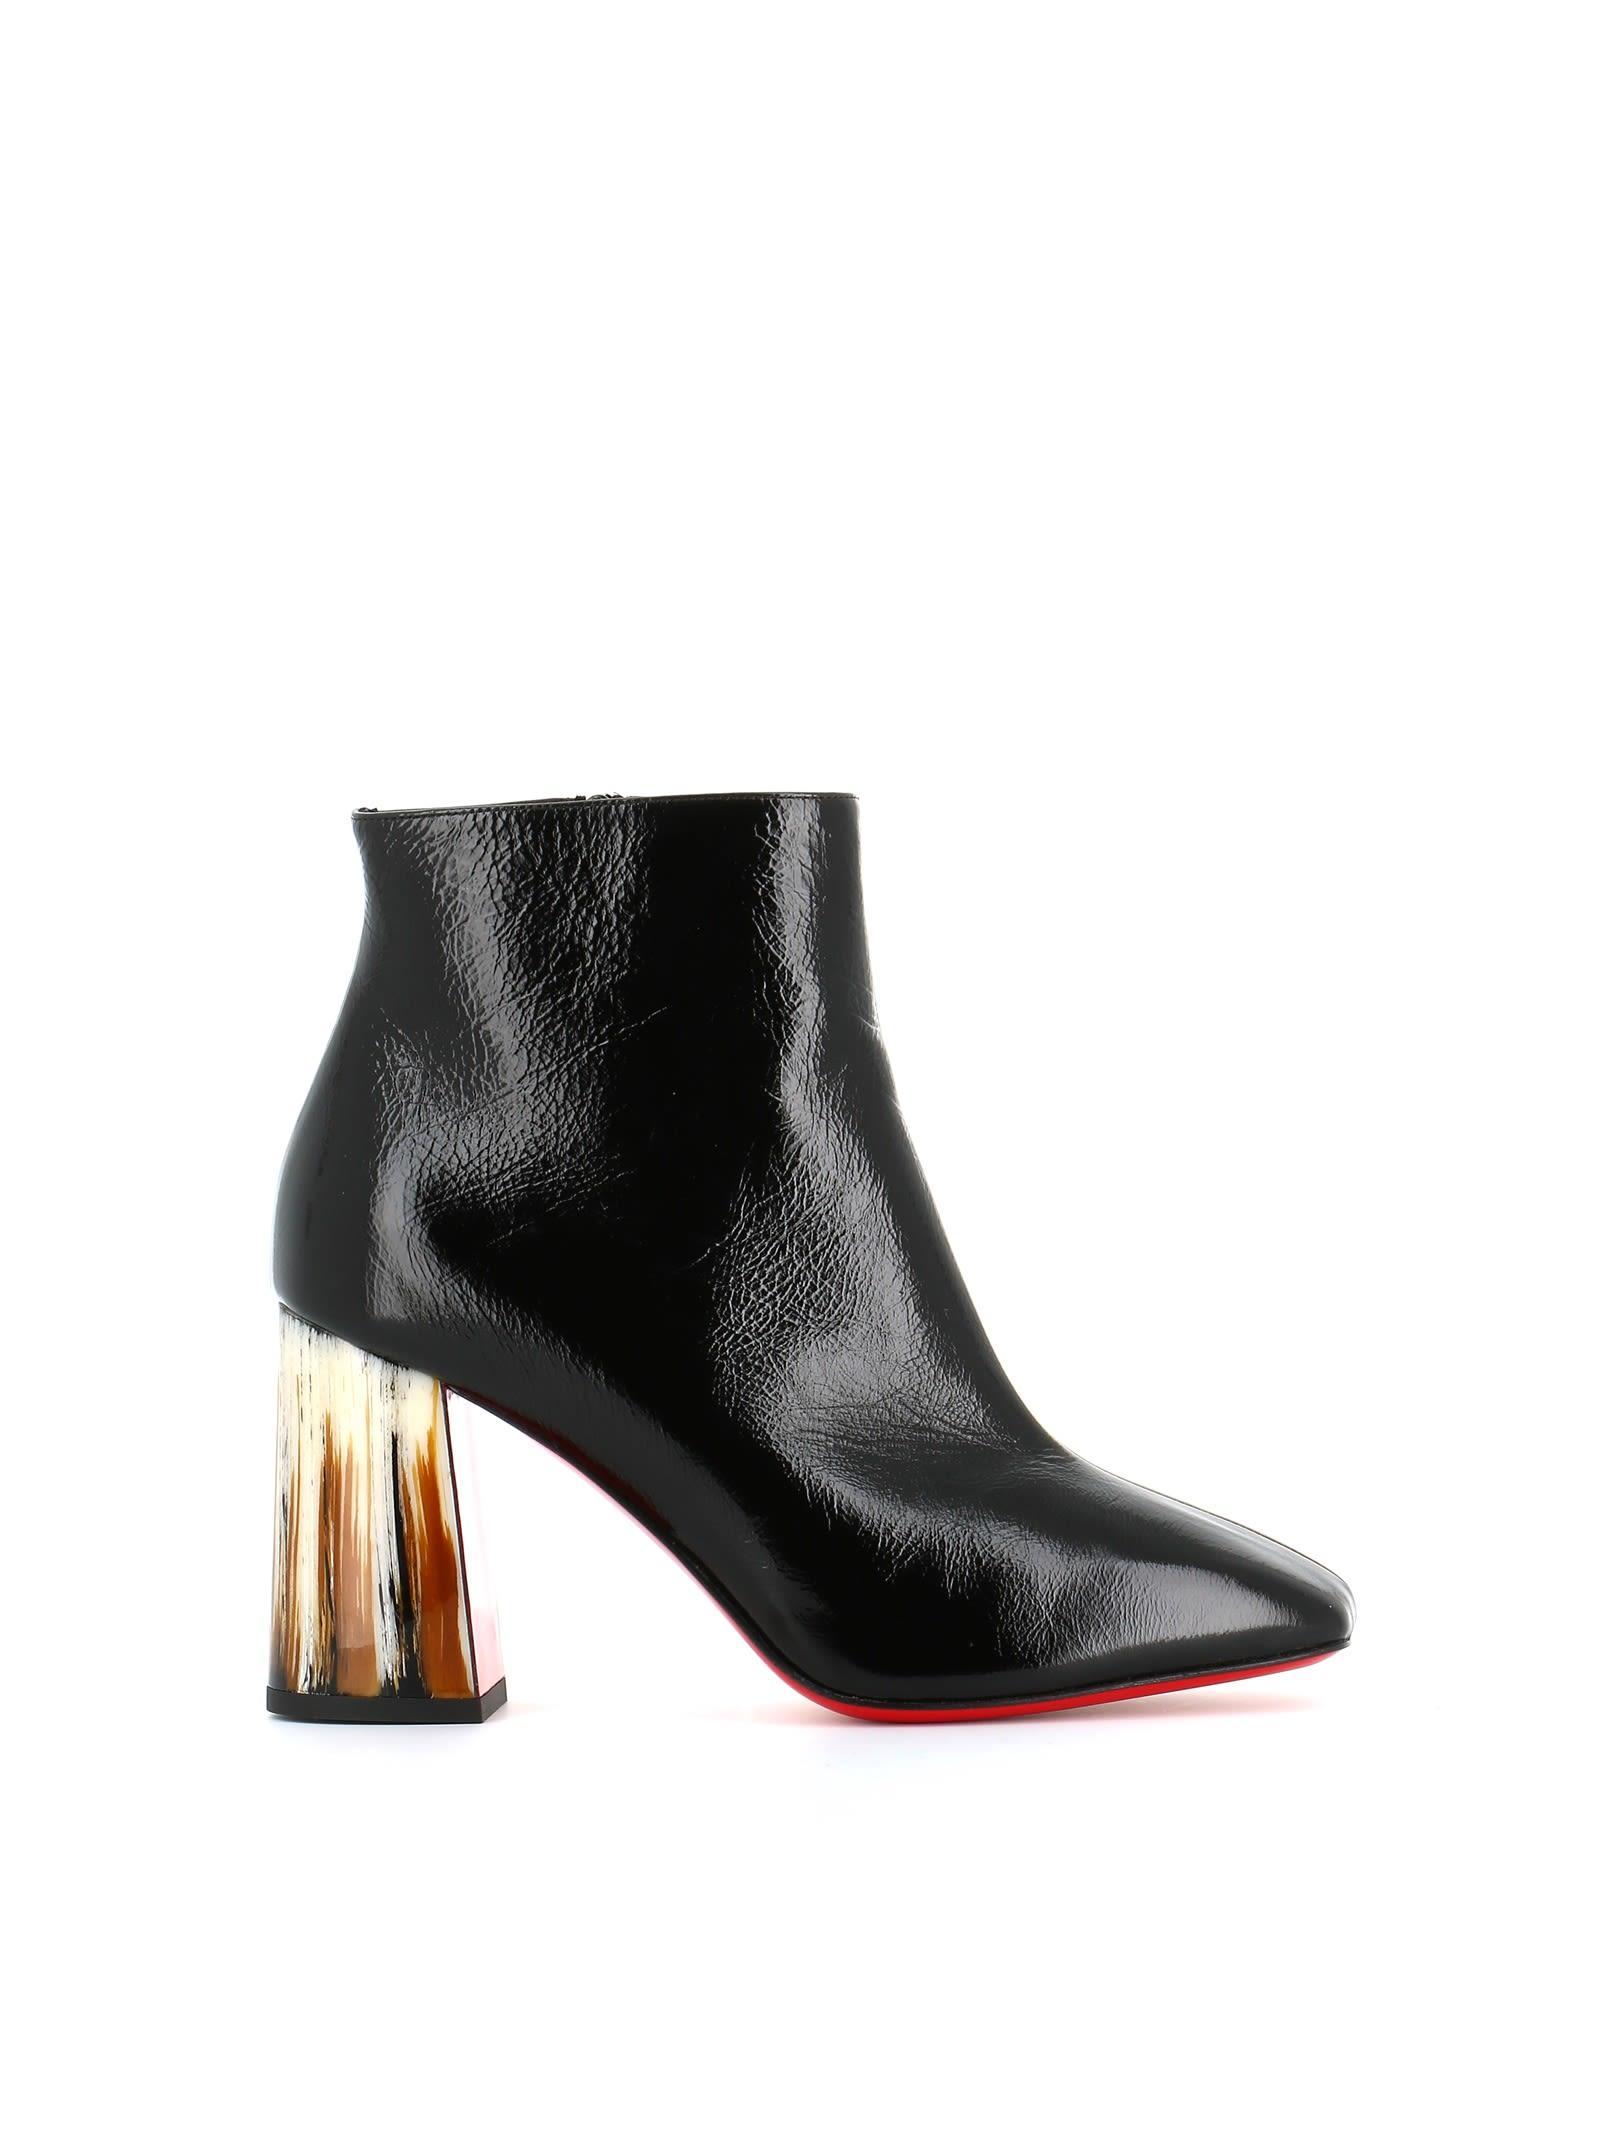 09dcb1c7123 Christian Louboutin Black Patent Leather Hilconico